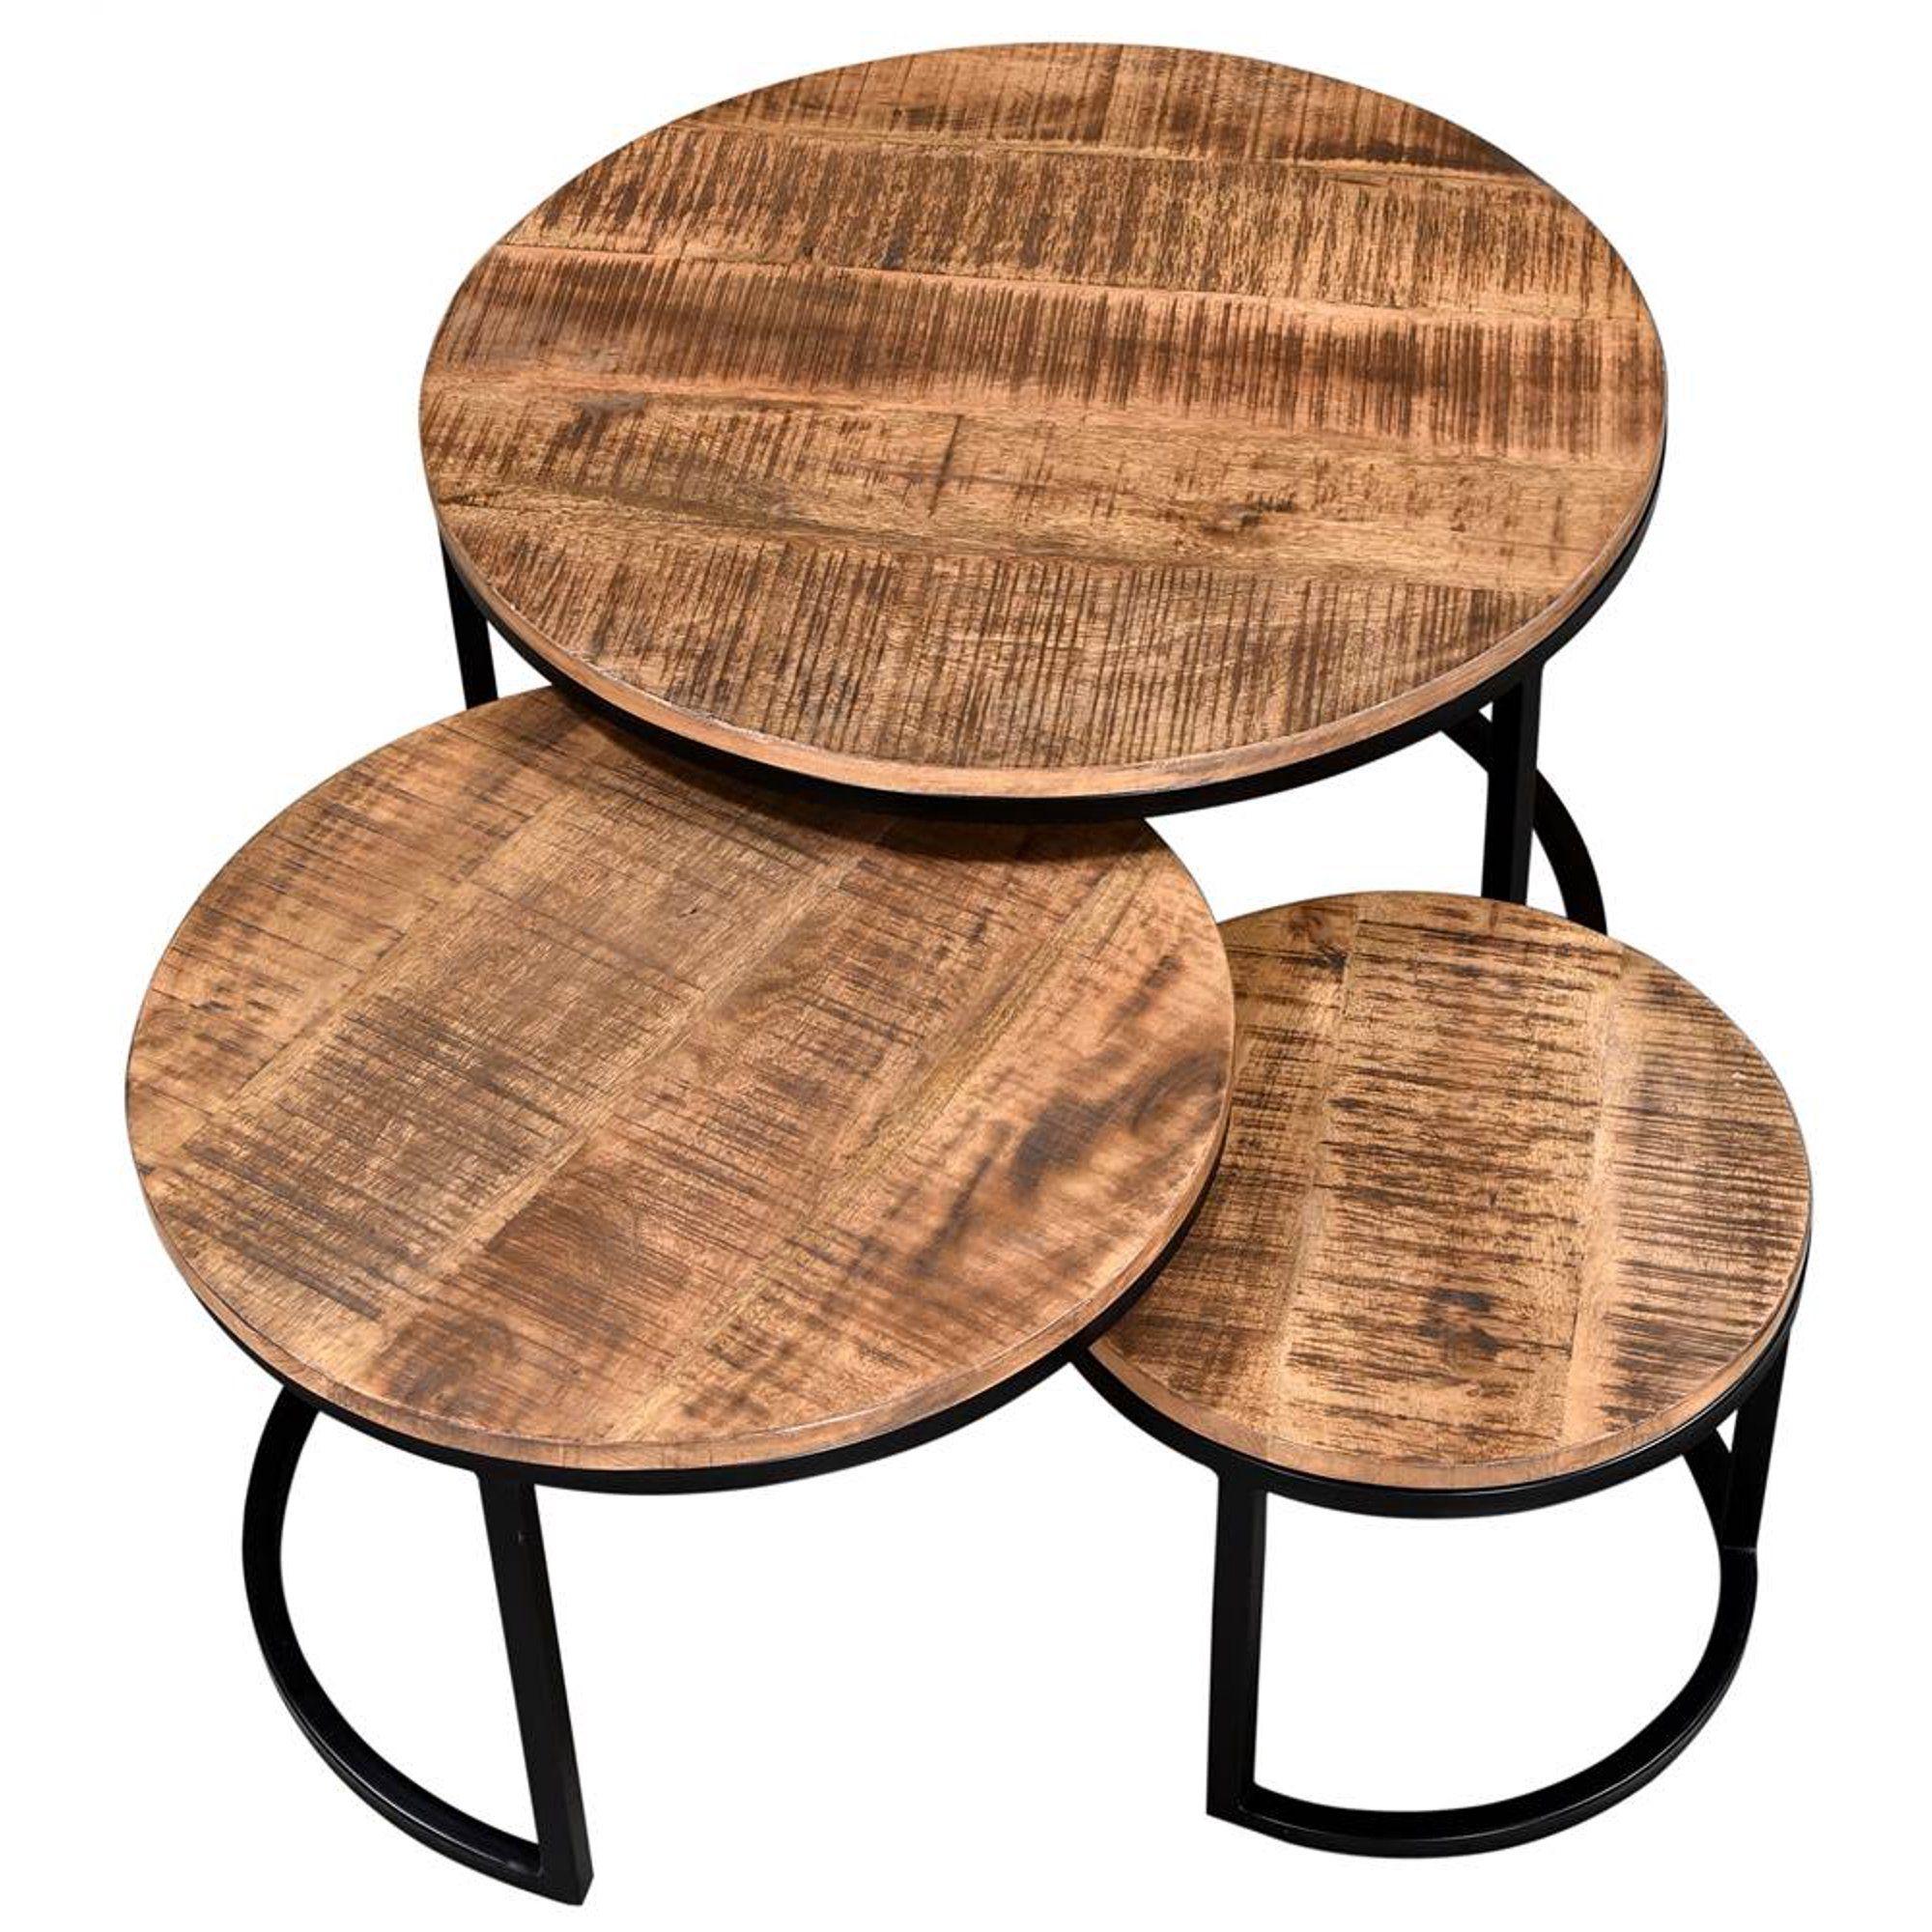 Rustic Modern Solid Wood Metal 3pc Coffee Table Set Walmart Com In 2021 3 Piece Coffee Table Set Nesting Coffee Tables Round Nesting Coffee Tables [ 2000 x 2000 Pixel ]